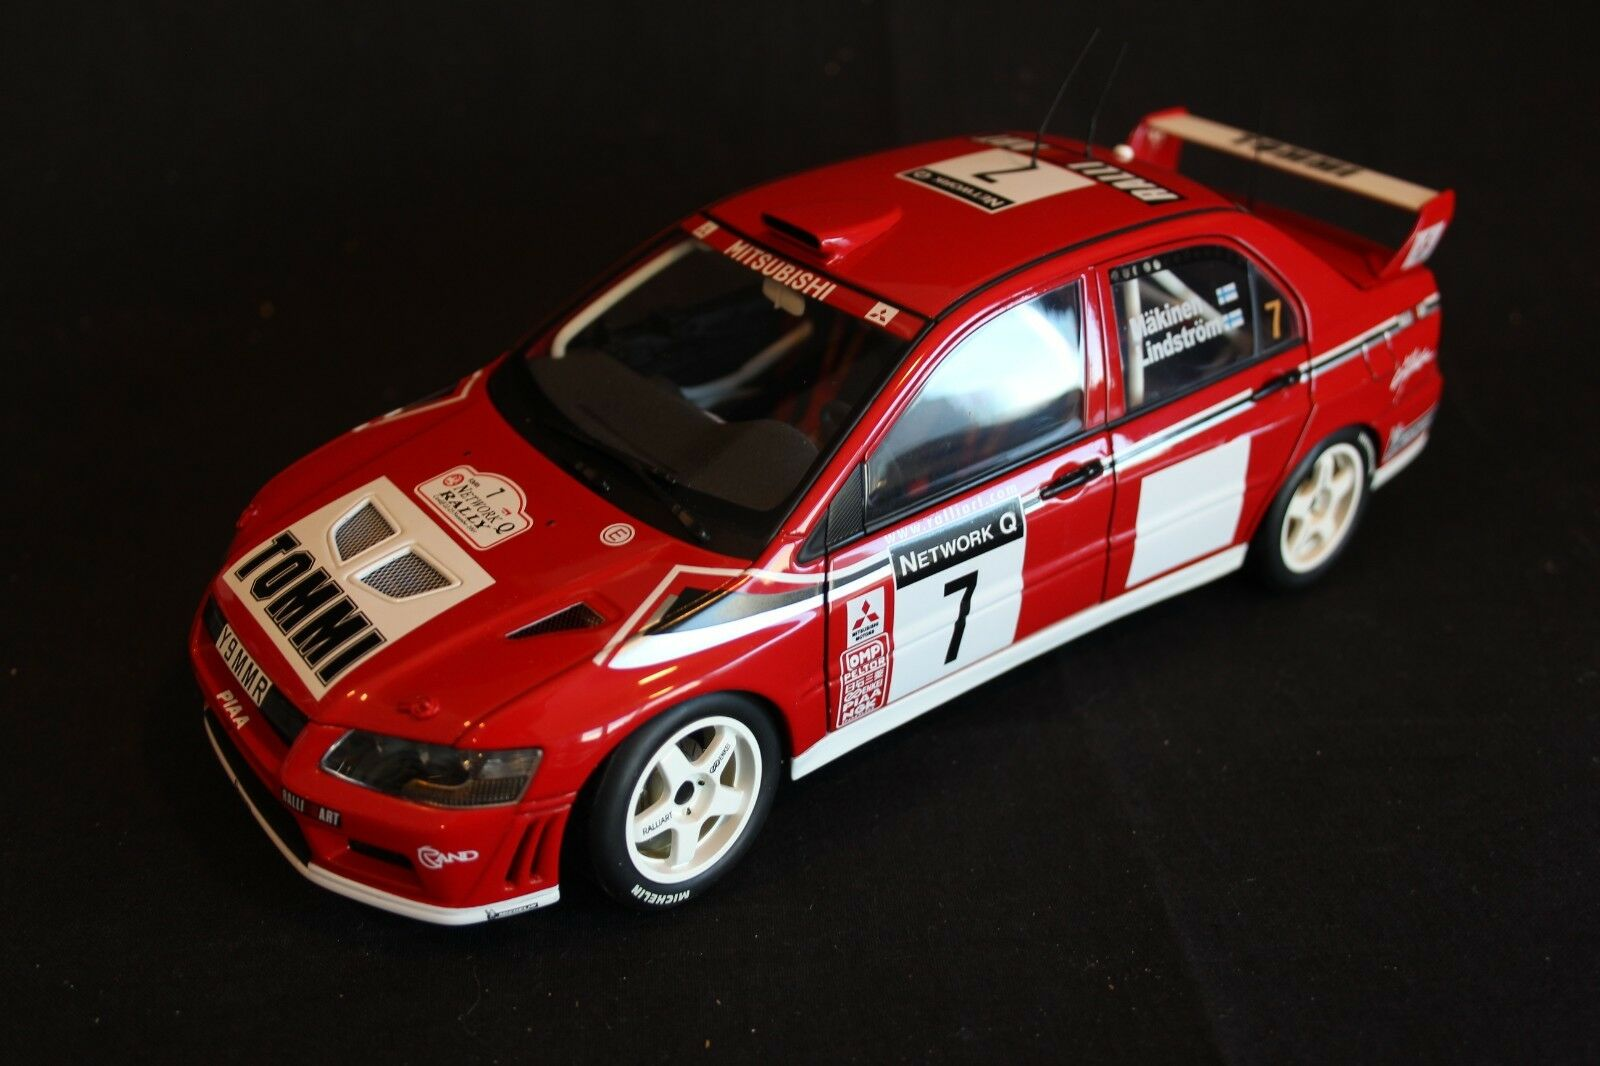 AutoArt Mitsubishi Lancer WRC 2001 1 18  7 Makinen   Lindström Network Q (AK)